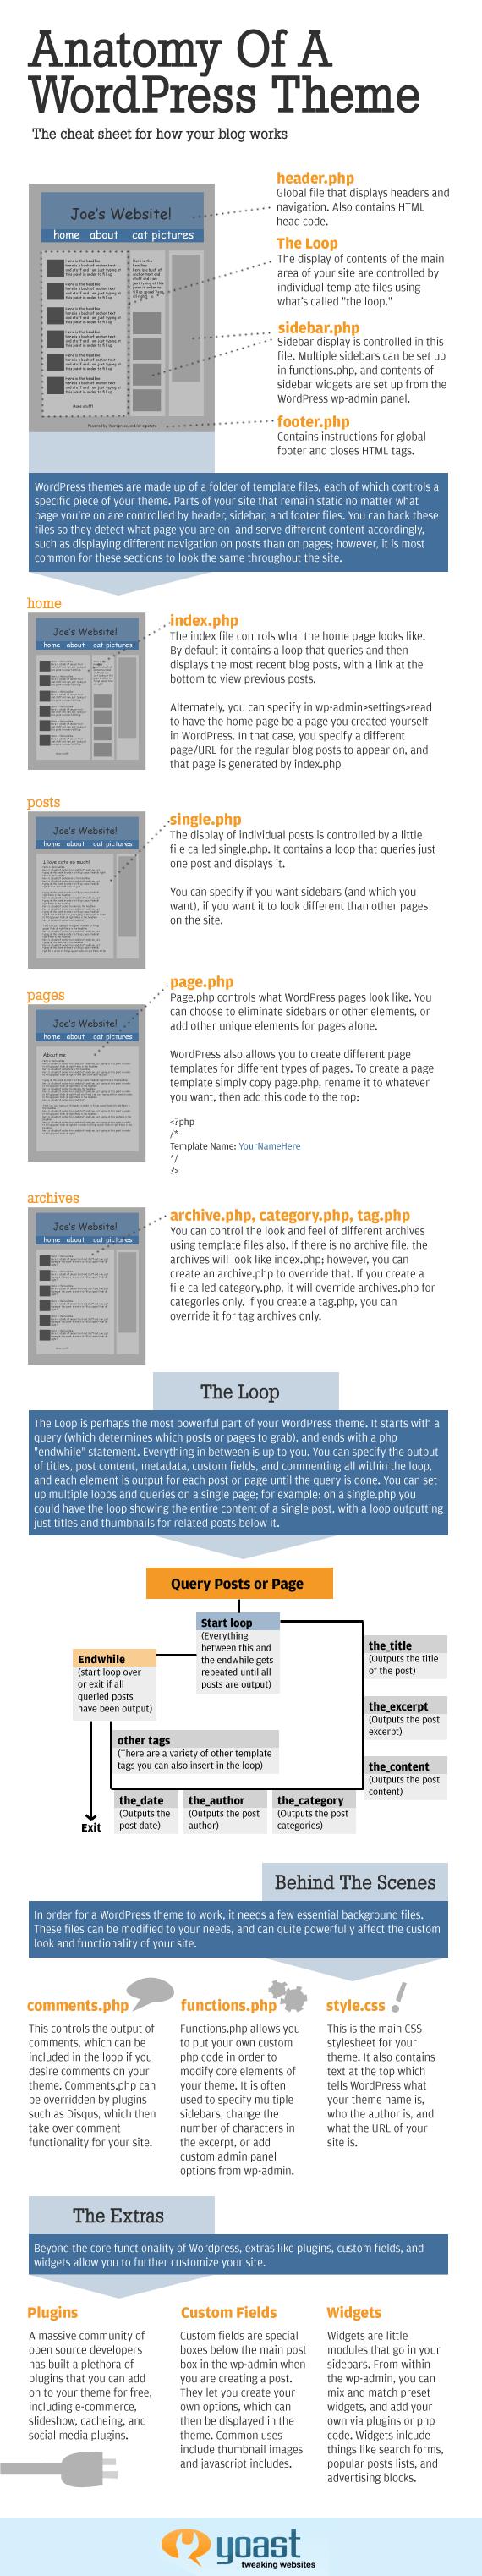 Where can I find free Wordpress theme development tutorials? - Quora